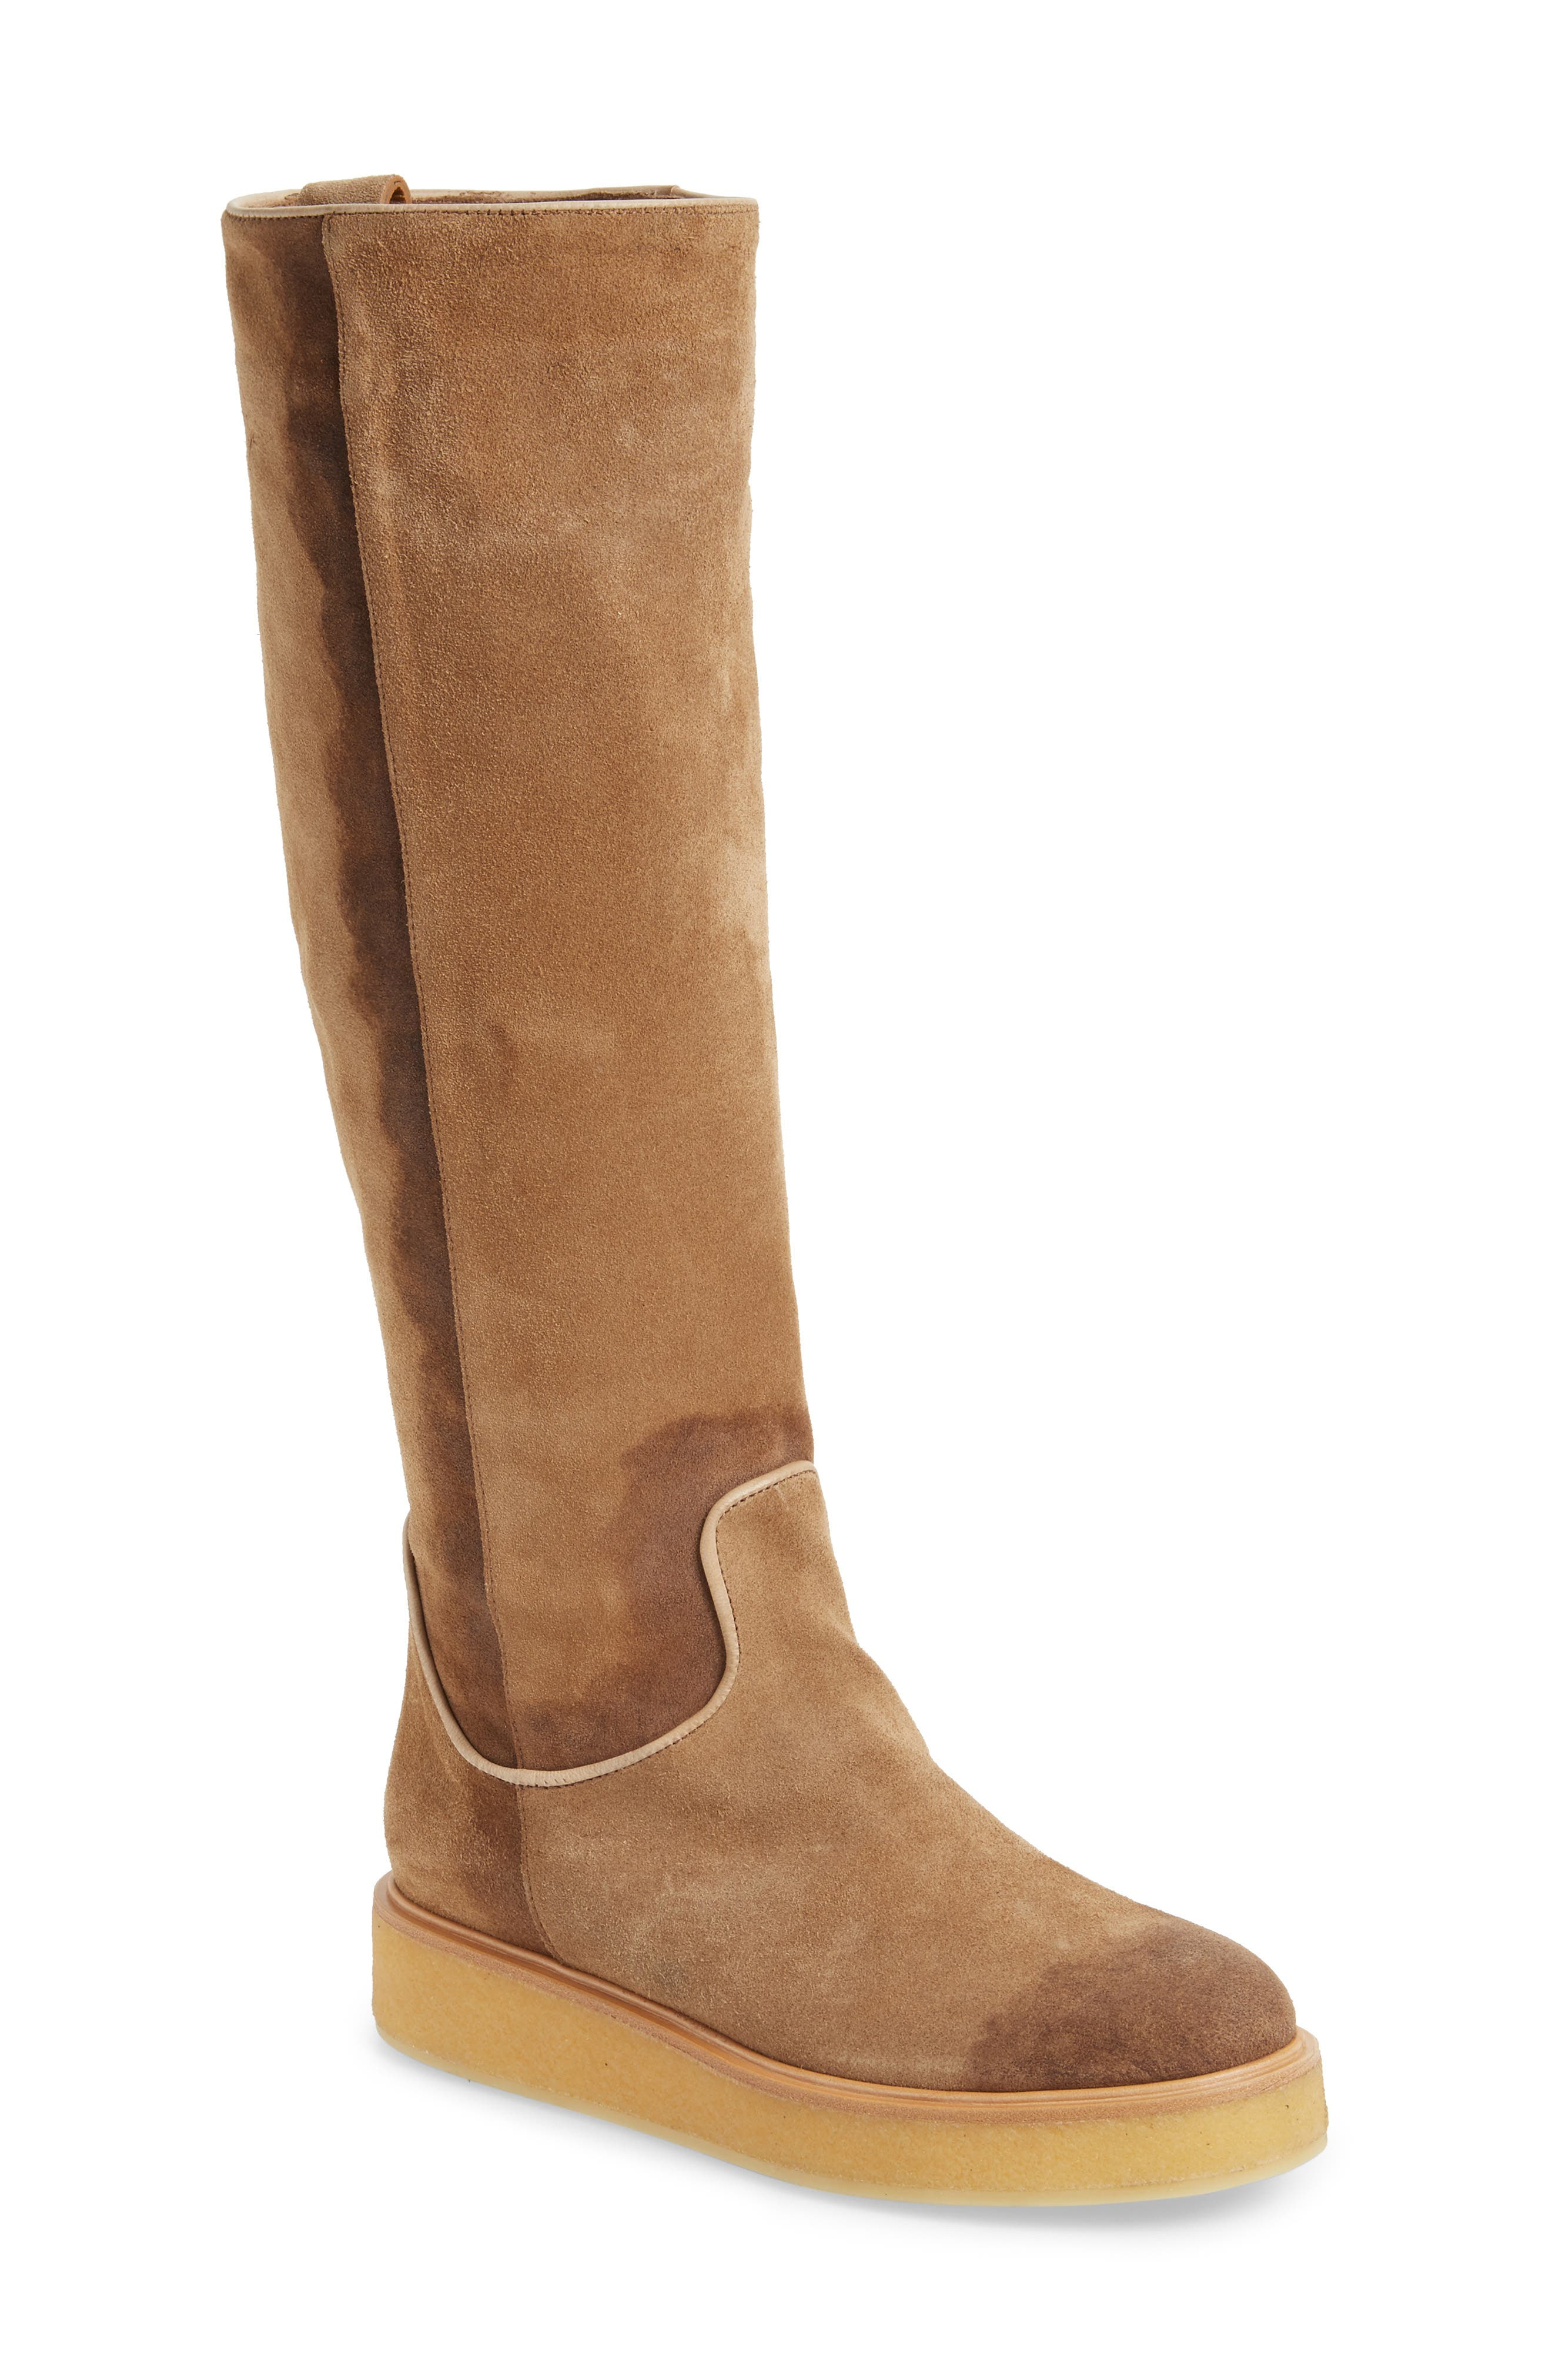 Nerola Knee High Boot,                         Main,                         color, 200